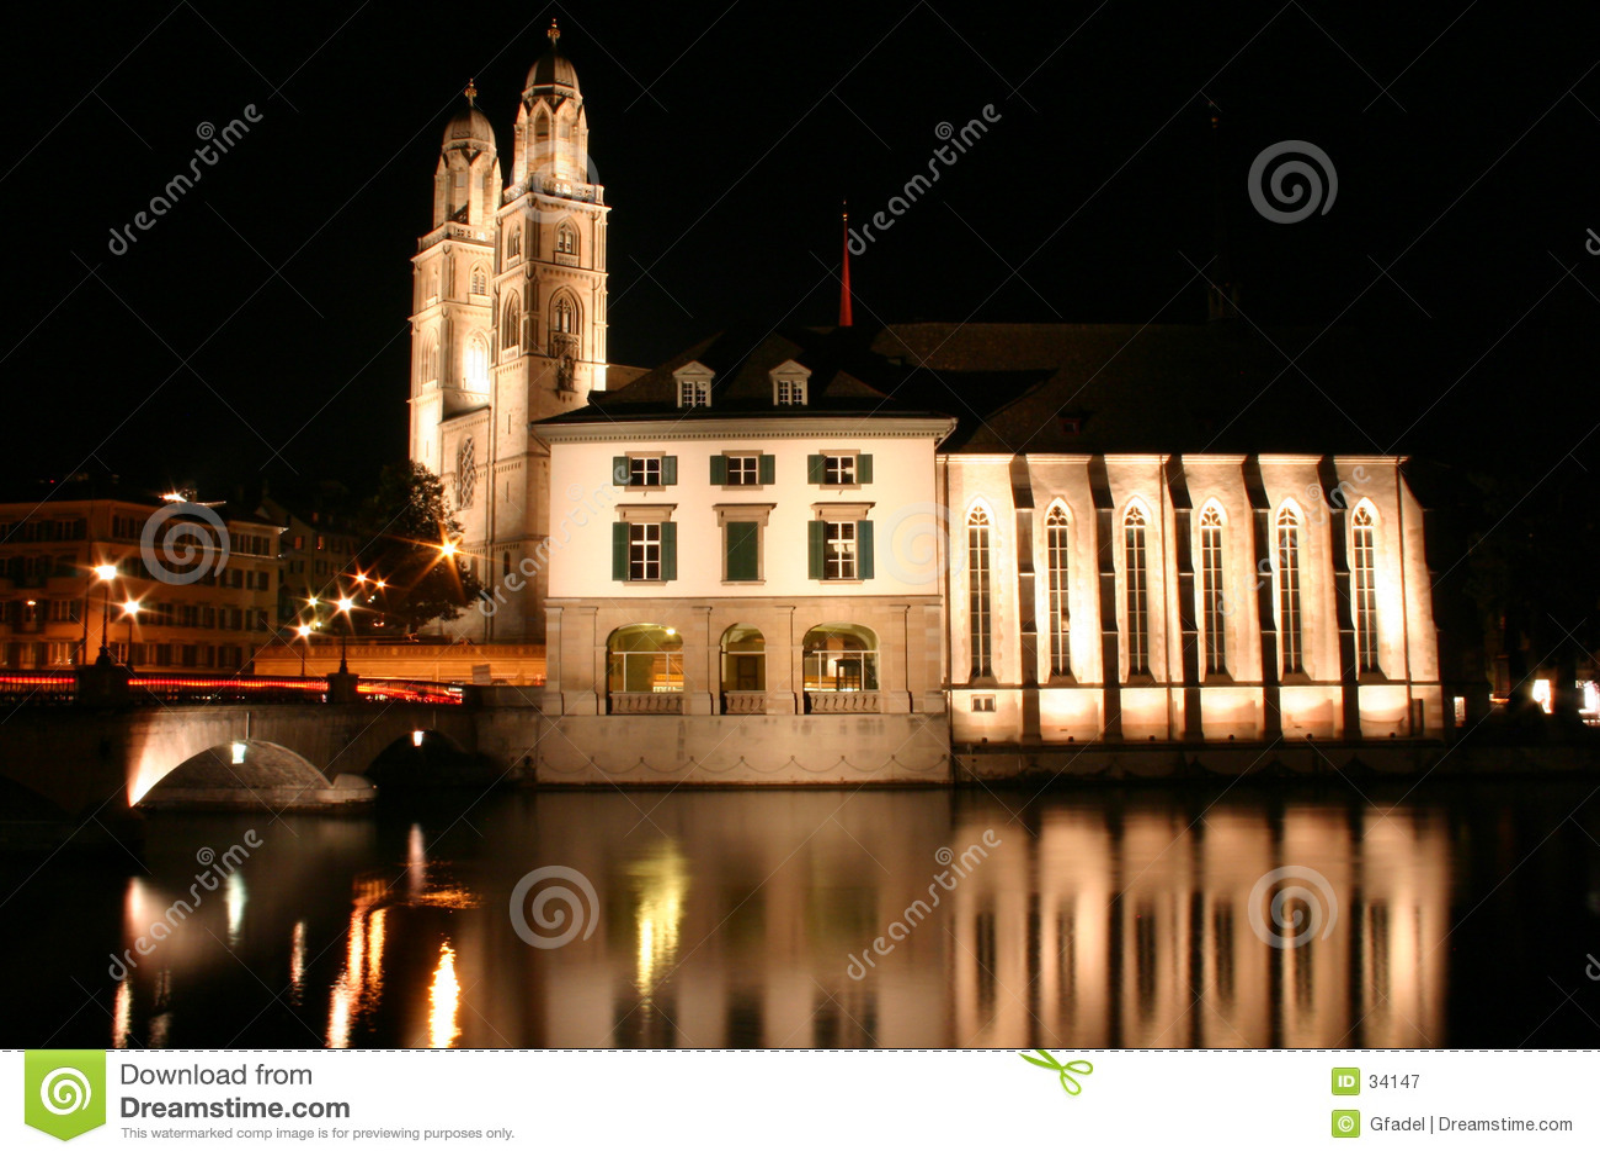 Download Zurich en la noche imagen de archivo. Imagen de zurich, suiza - 34147